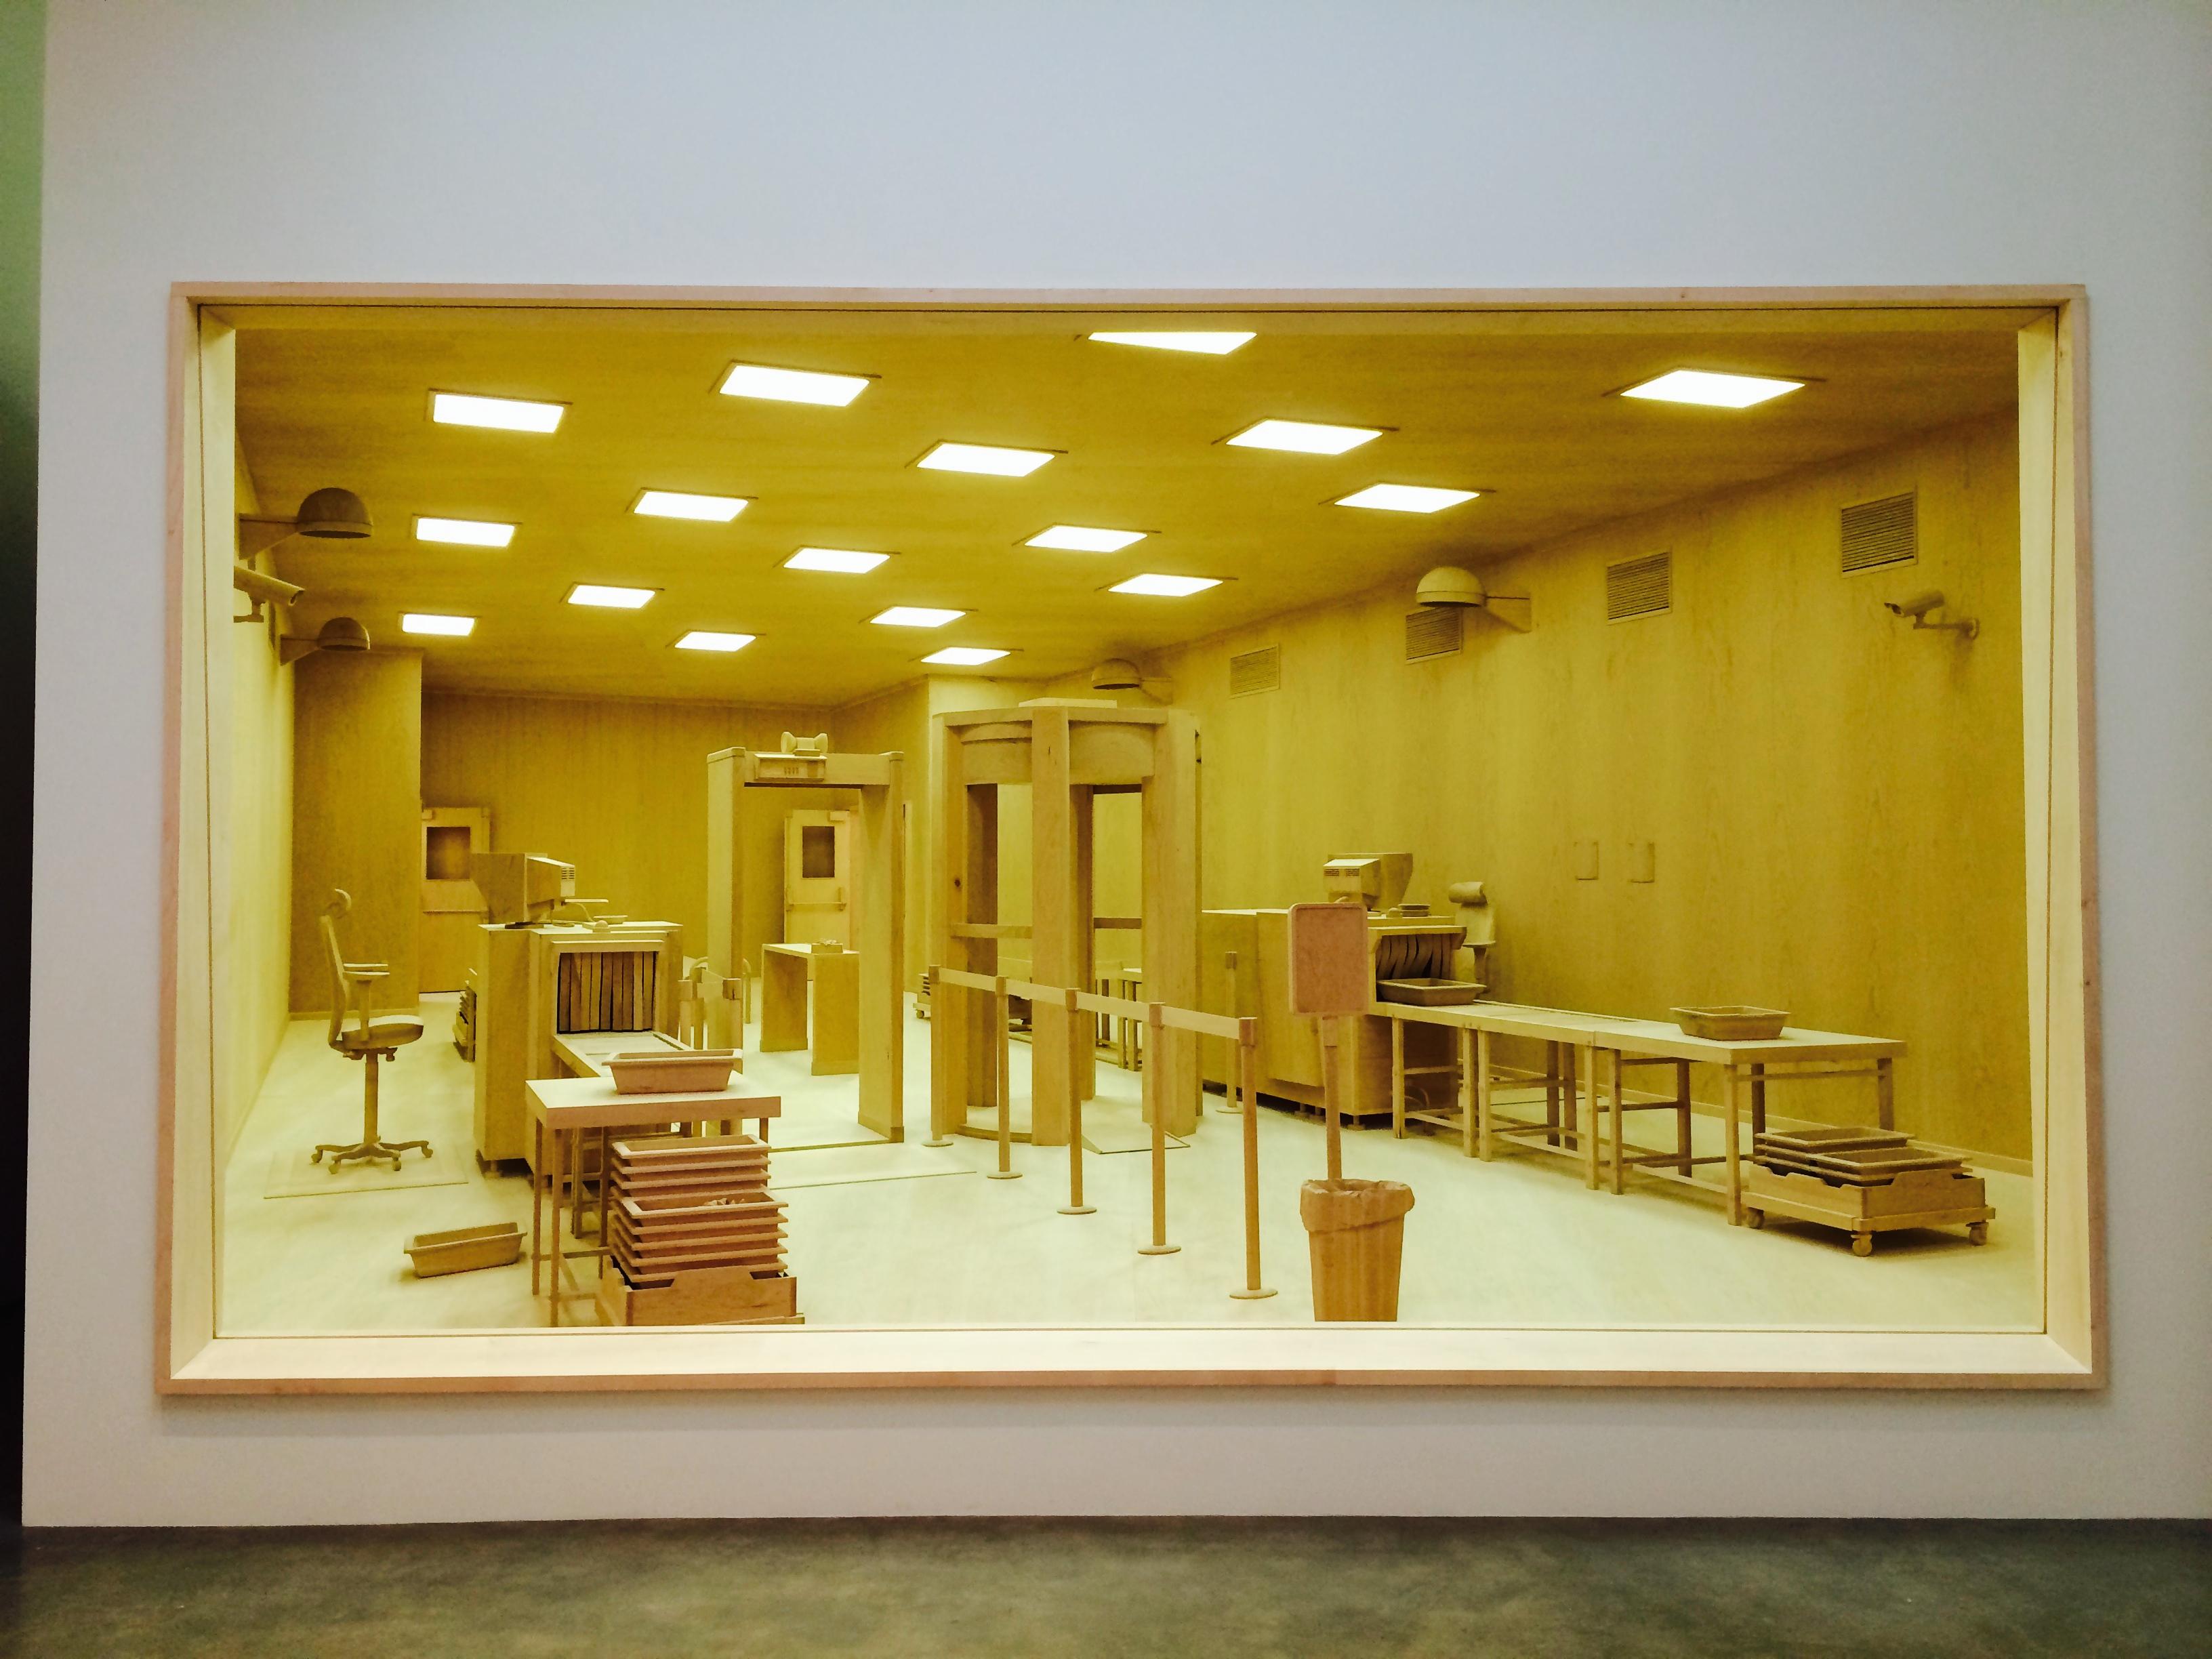 Roxy Paine, Diorama